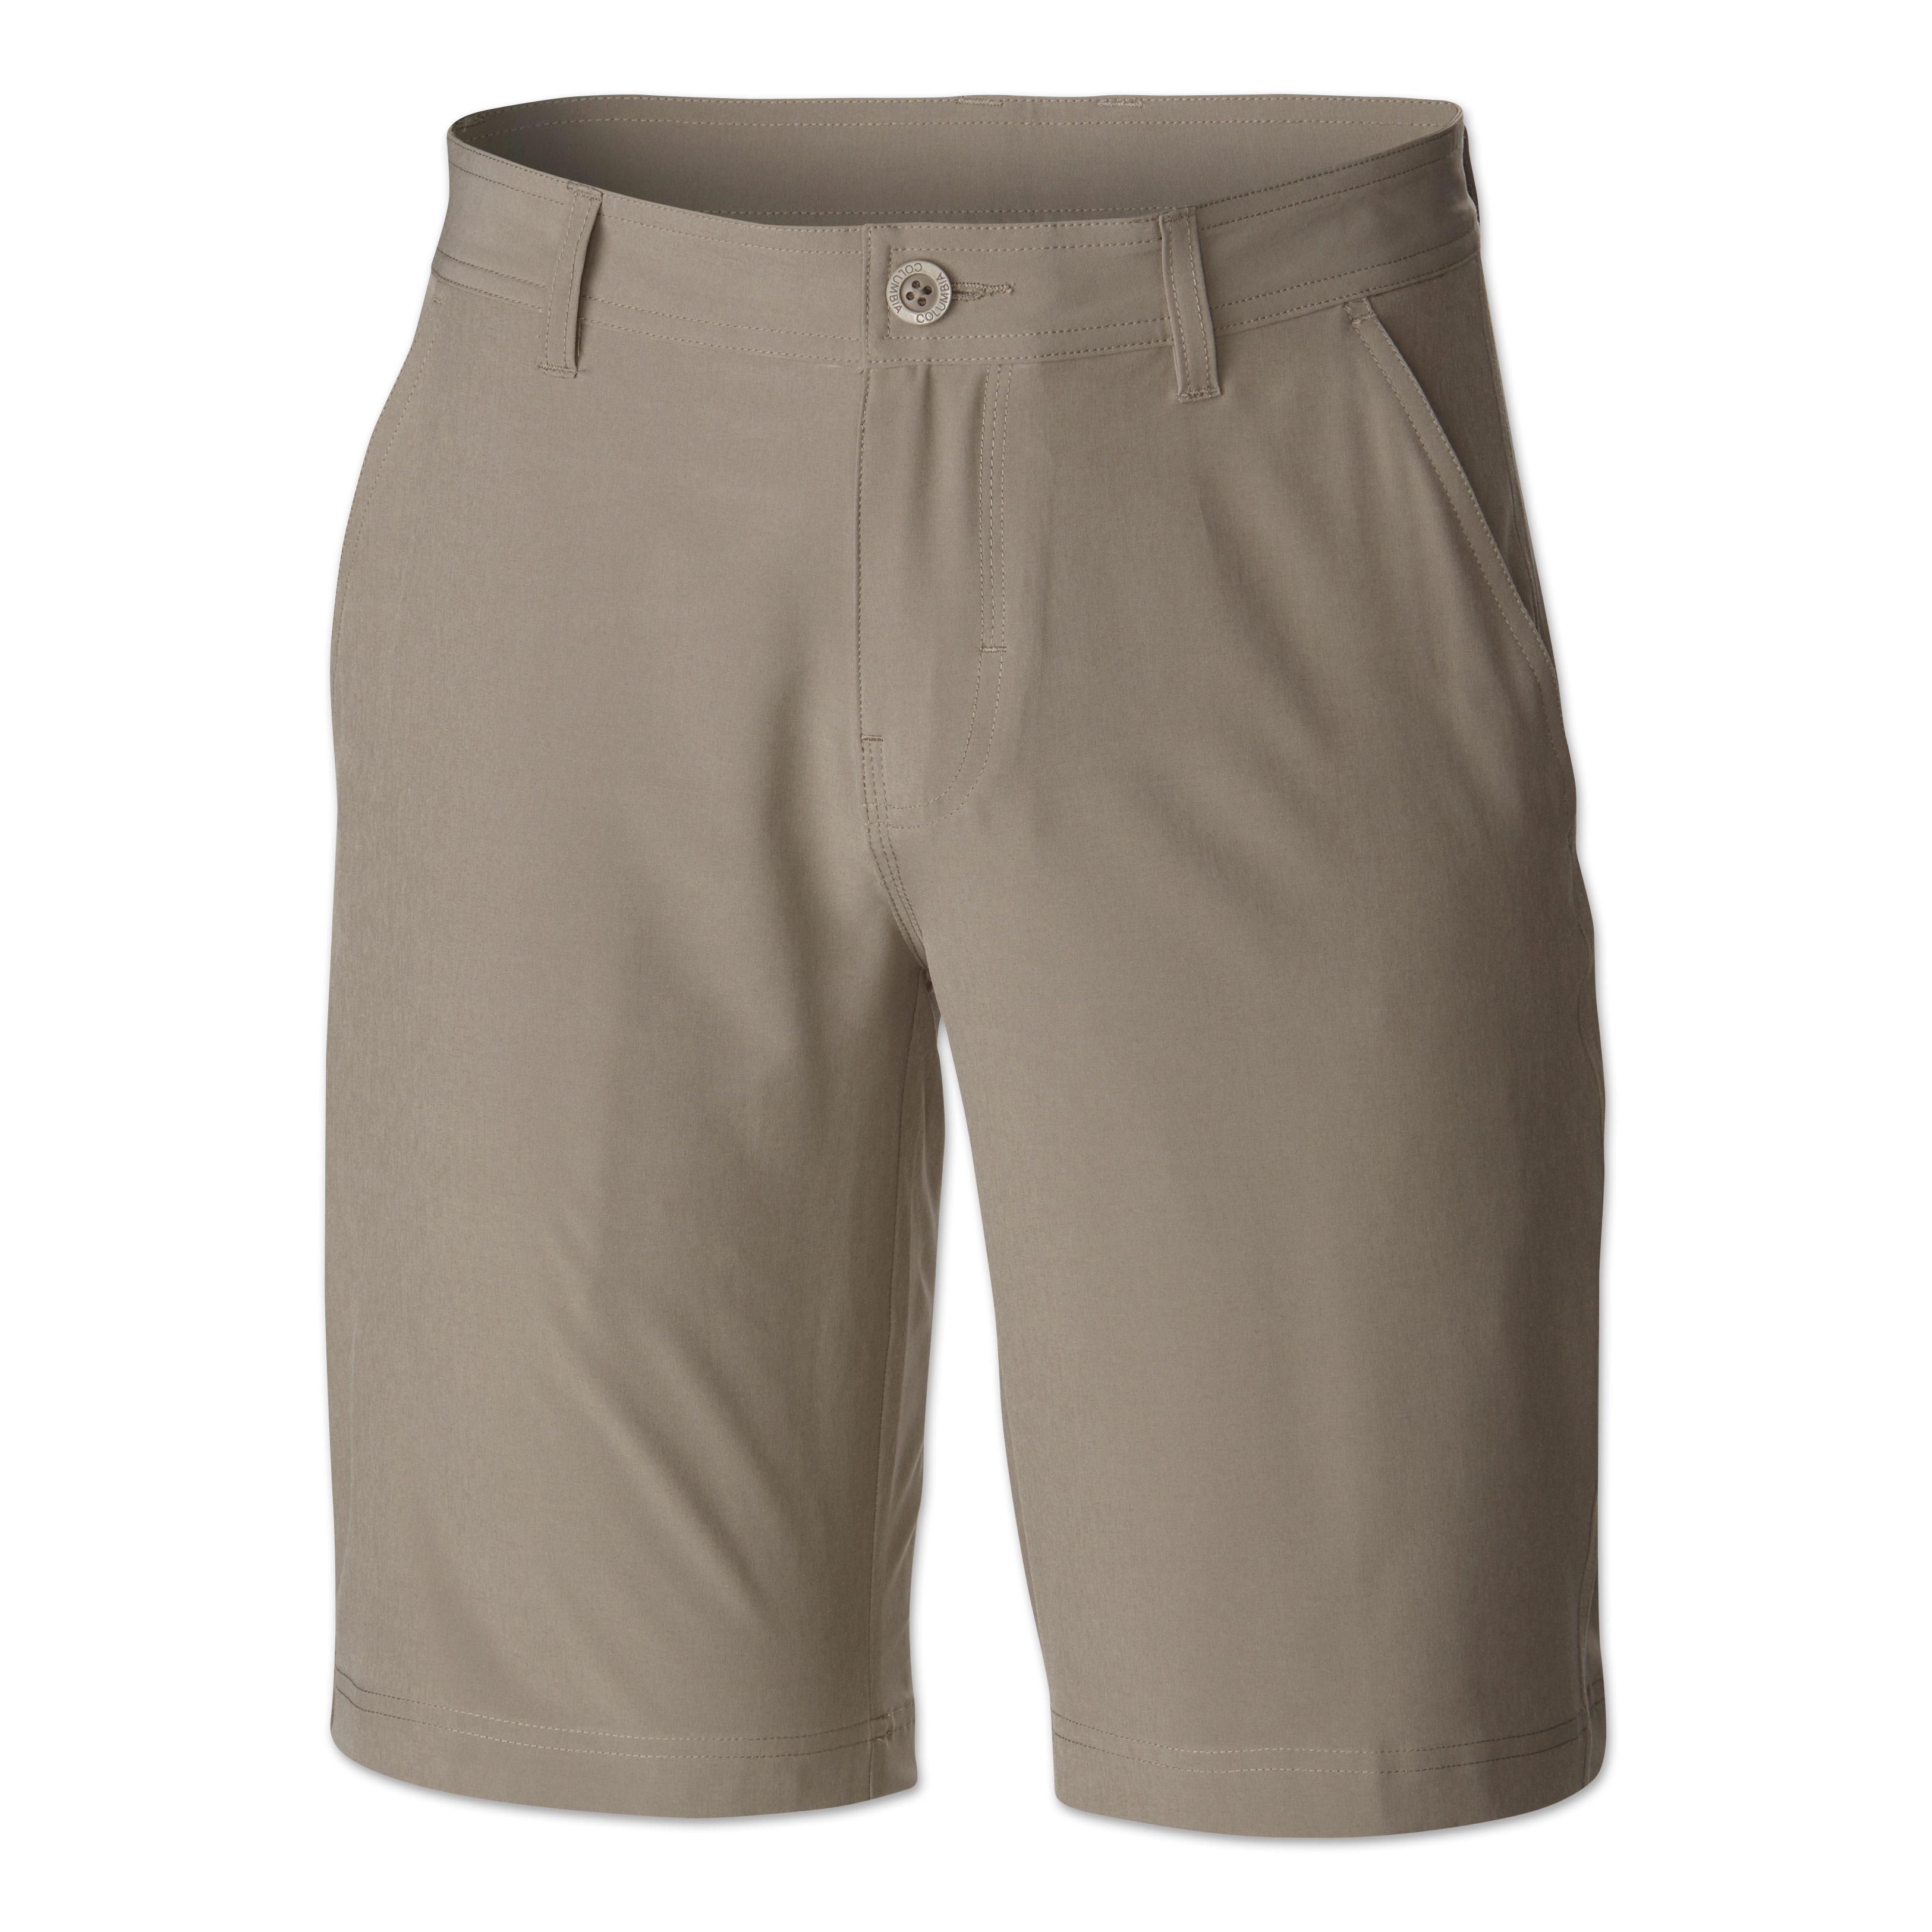 Men's Global Adventurer Shorts